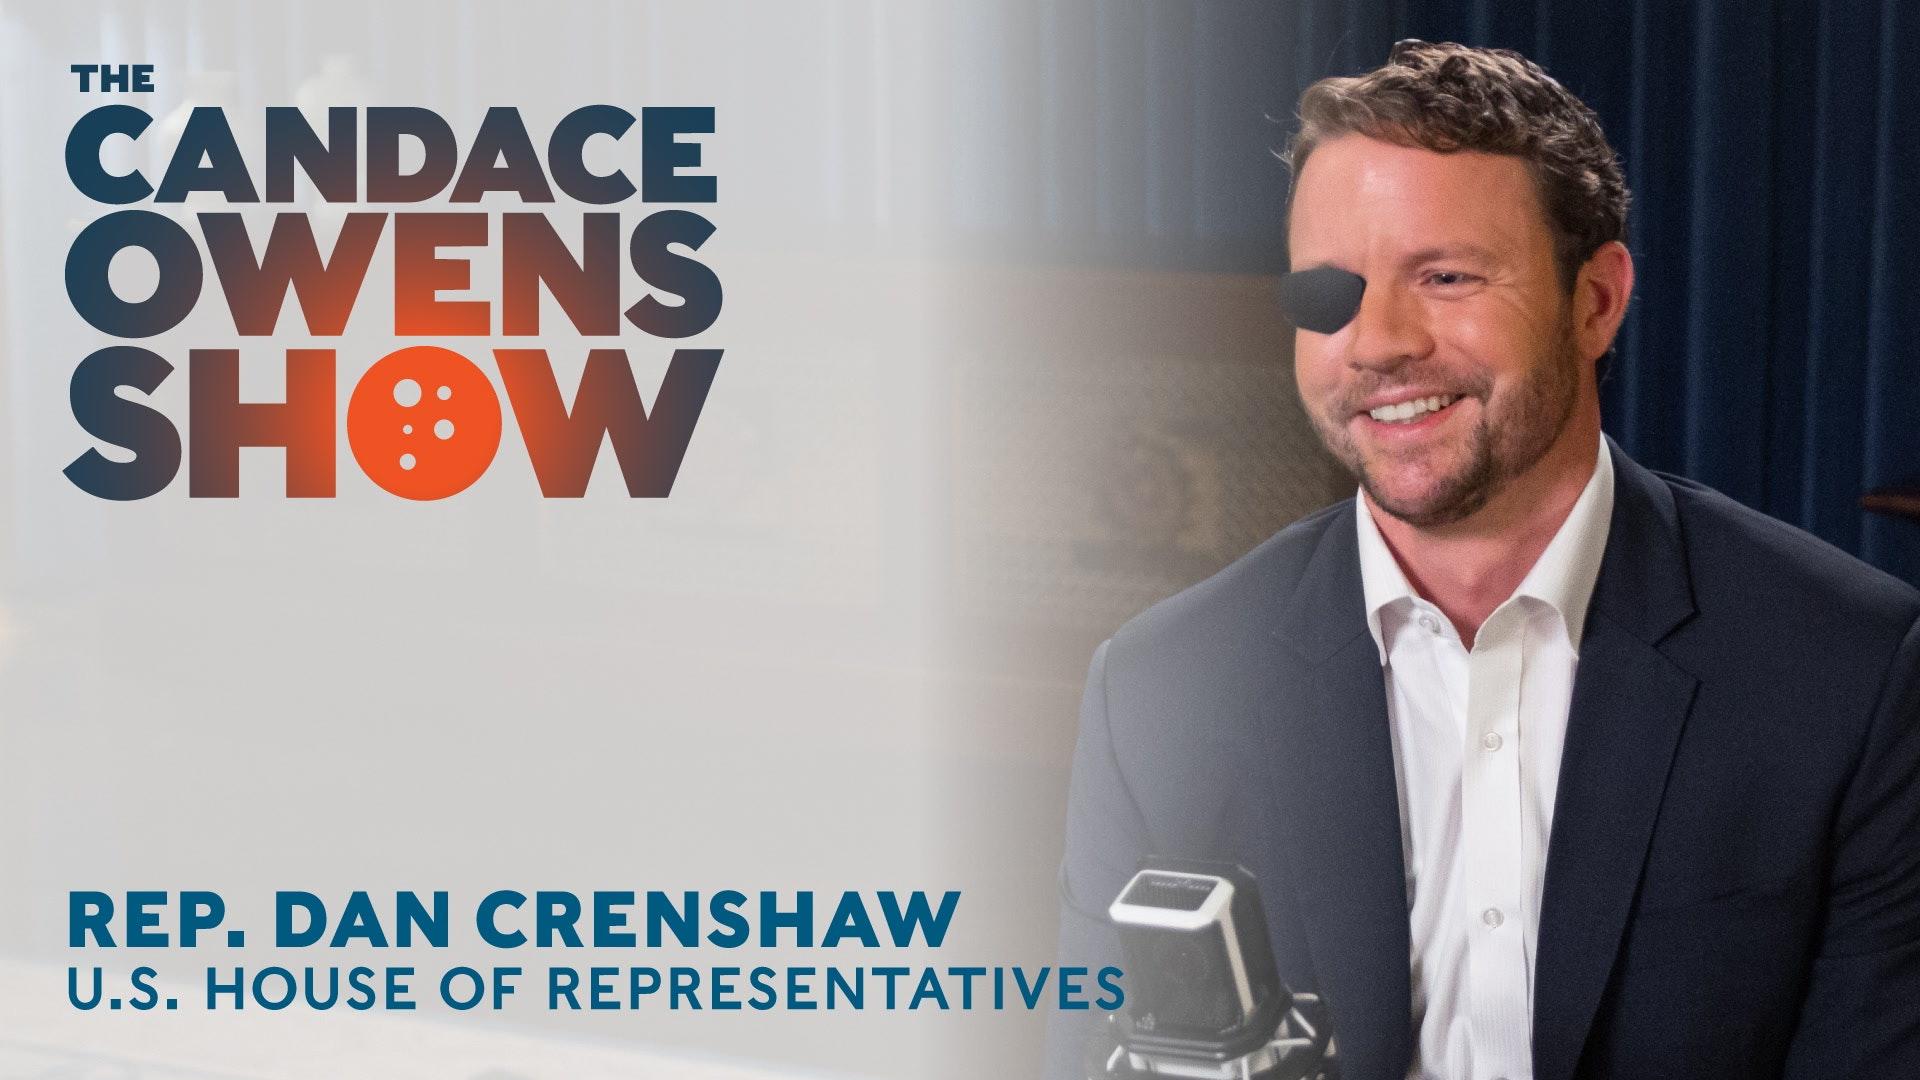 The Candace Owens Show: Rep. Dan Crenshaw